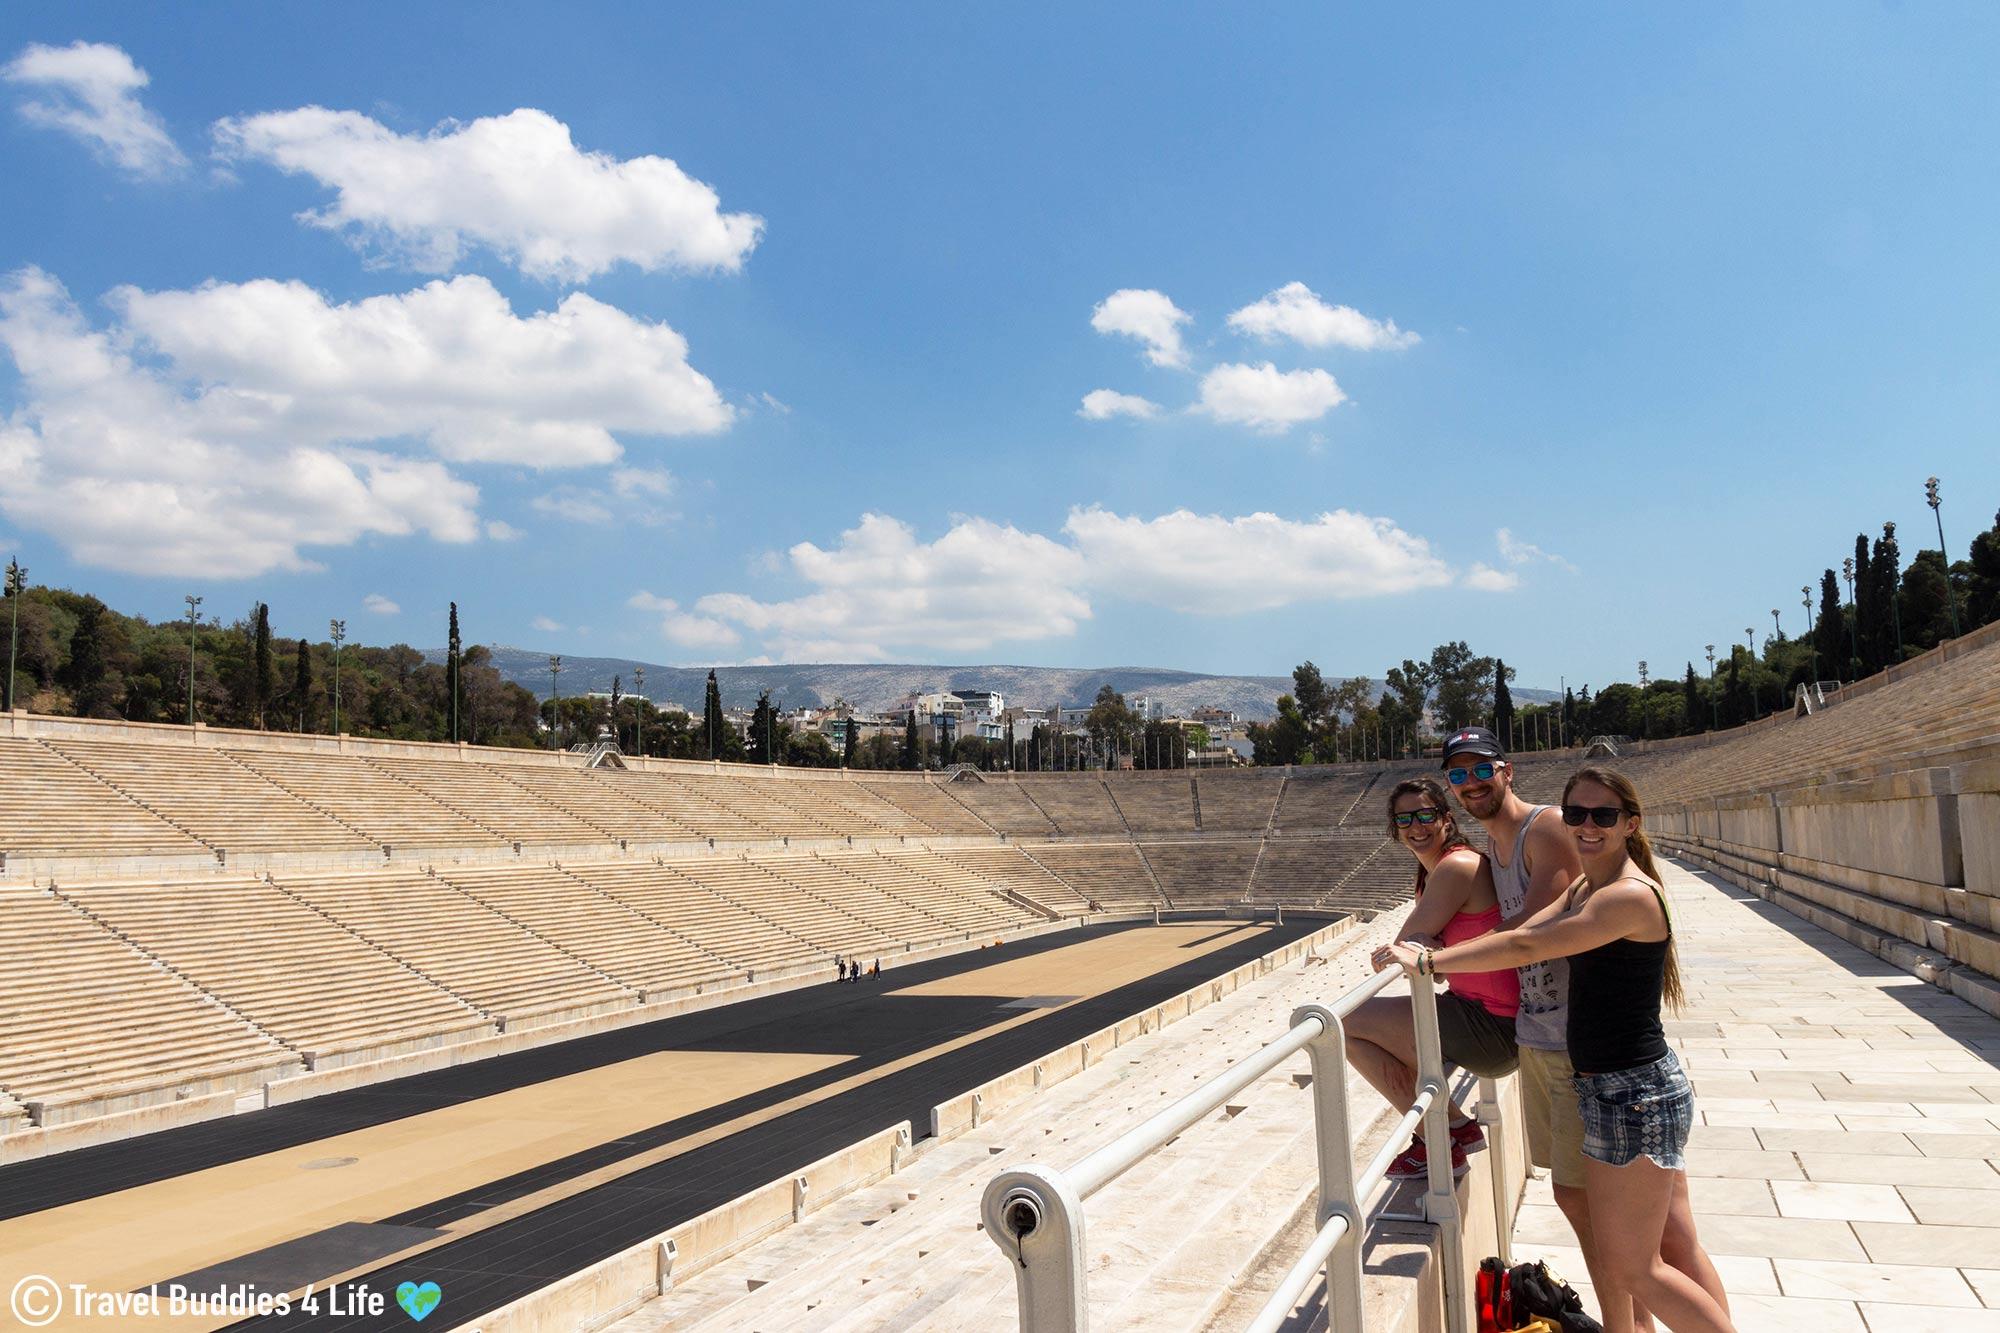 Joey, Nadine And Ali Looking At The Olympic Panathenaic Stadium While Touring Athens, Historic Greece, Europe